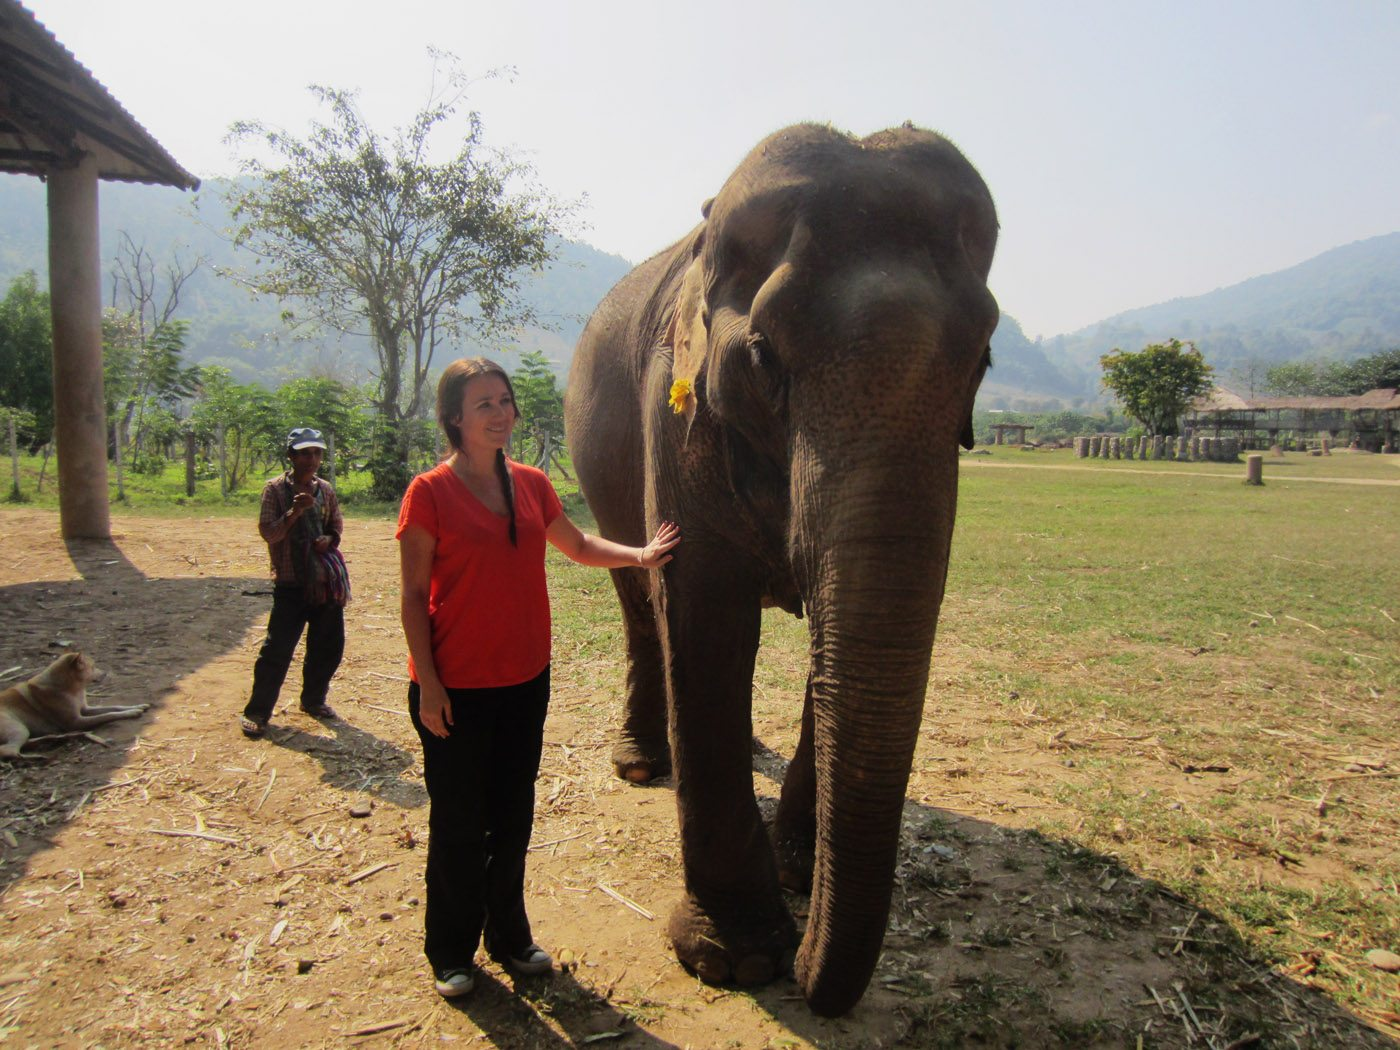 Do not ride elephants